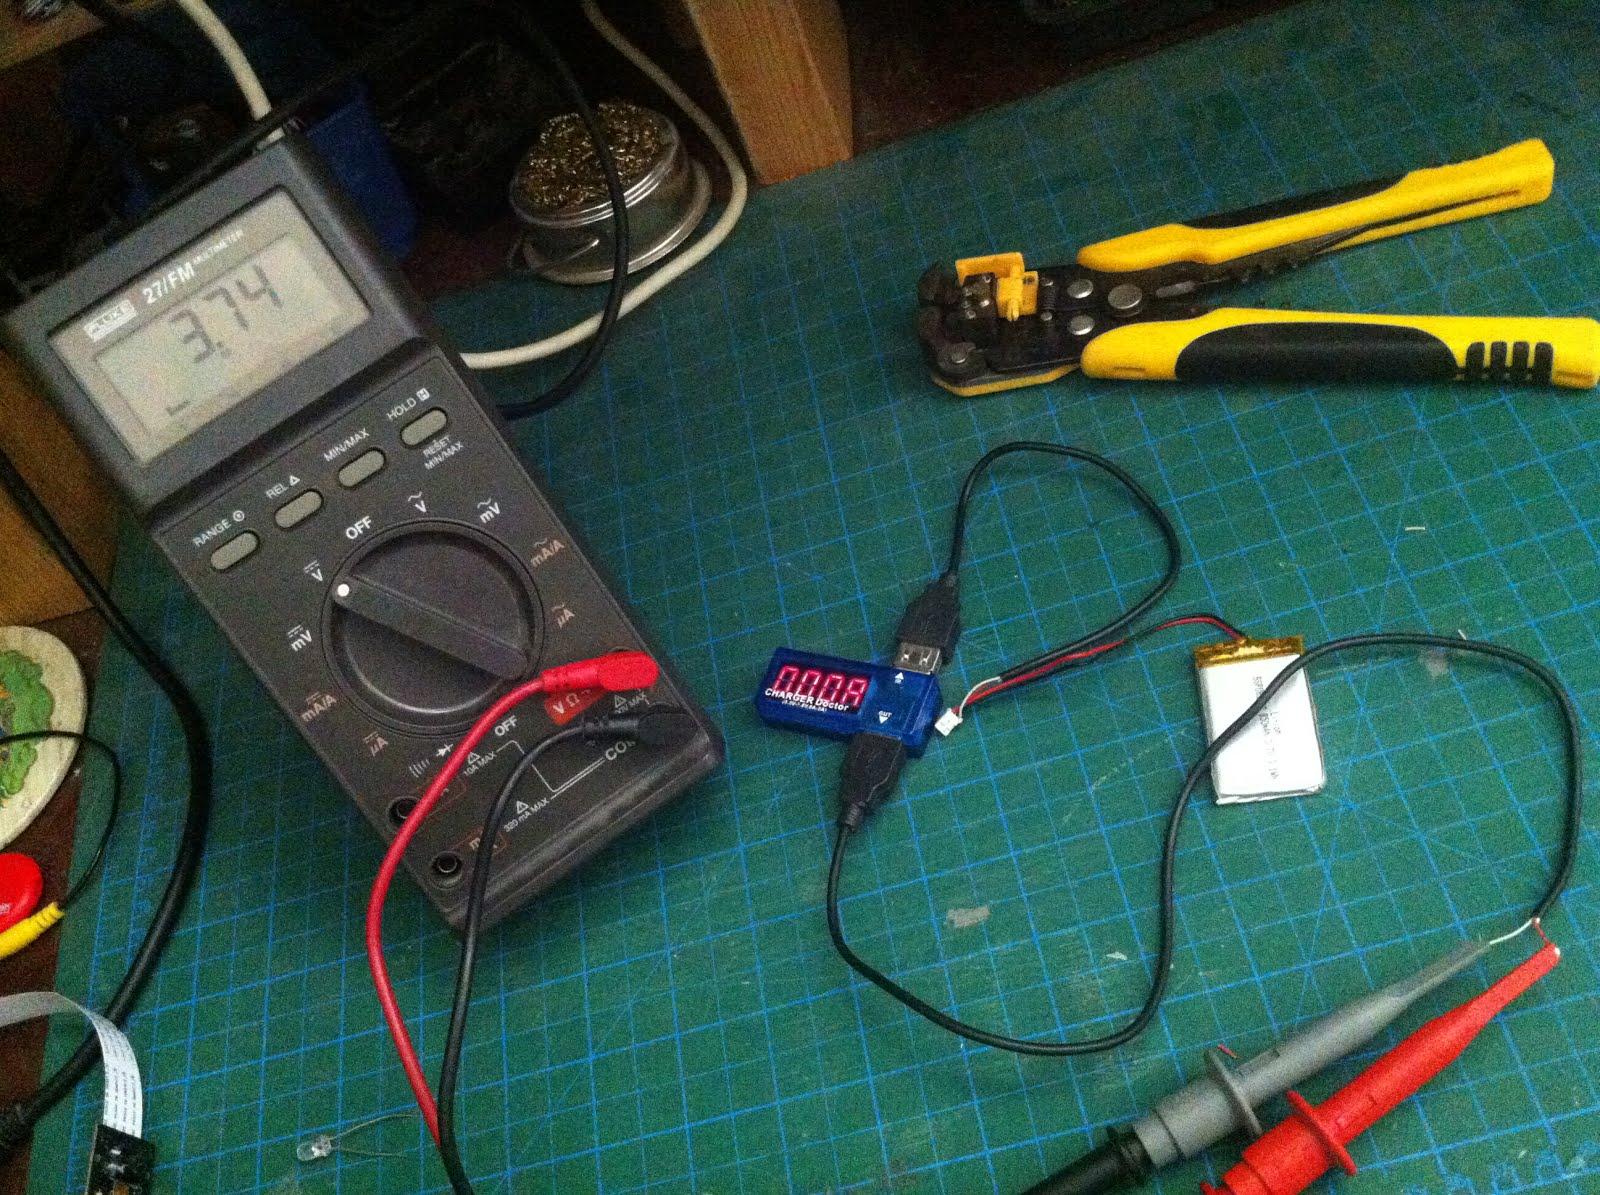 diy projects: usb power meter hack